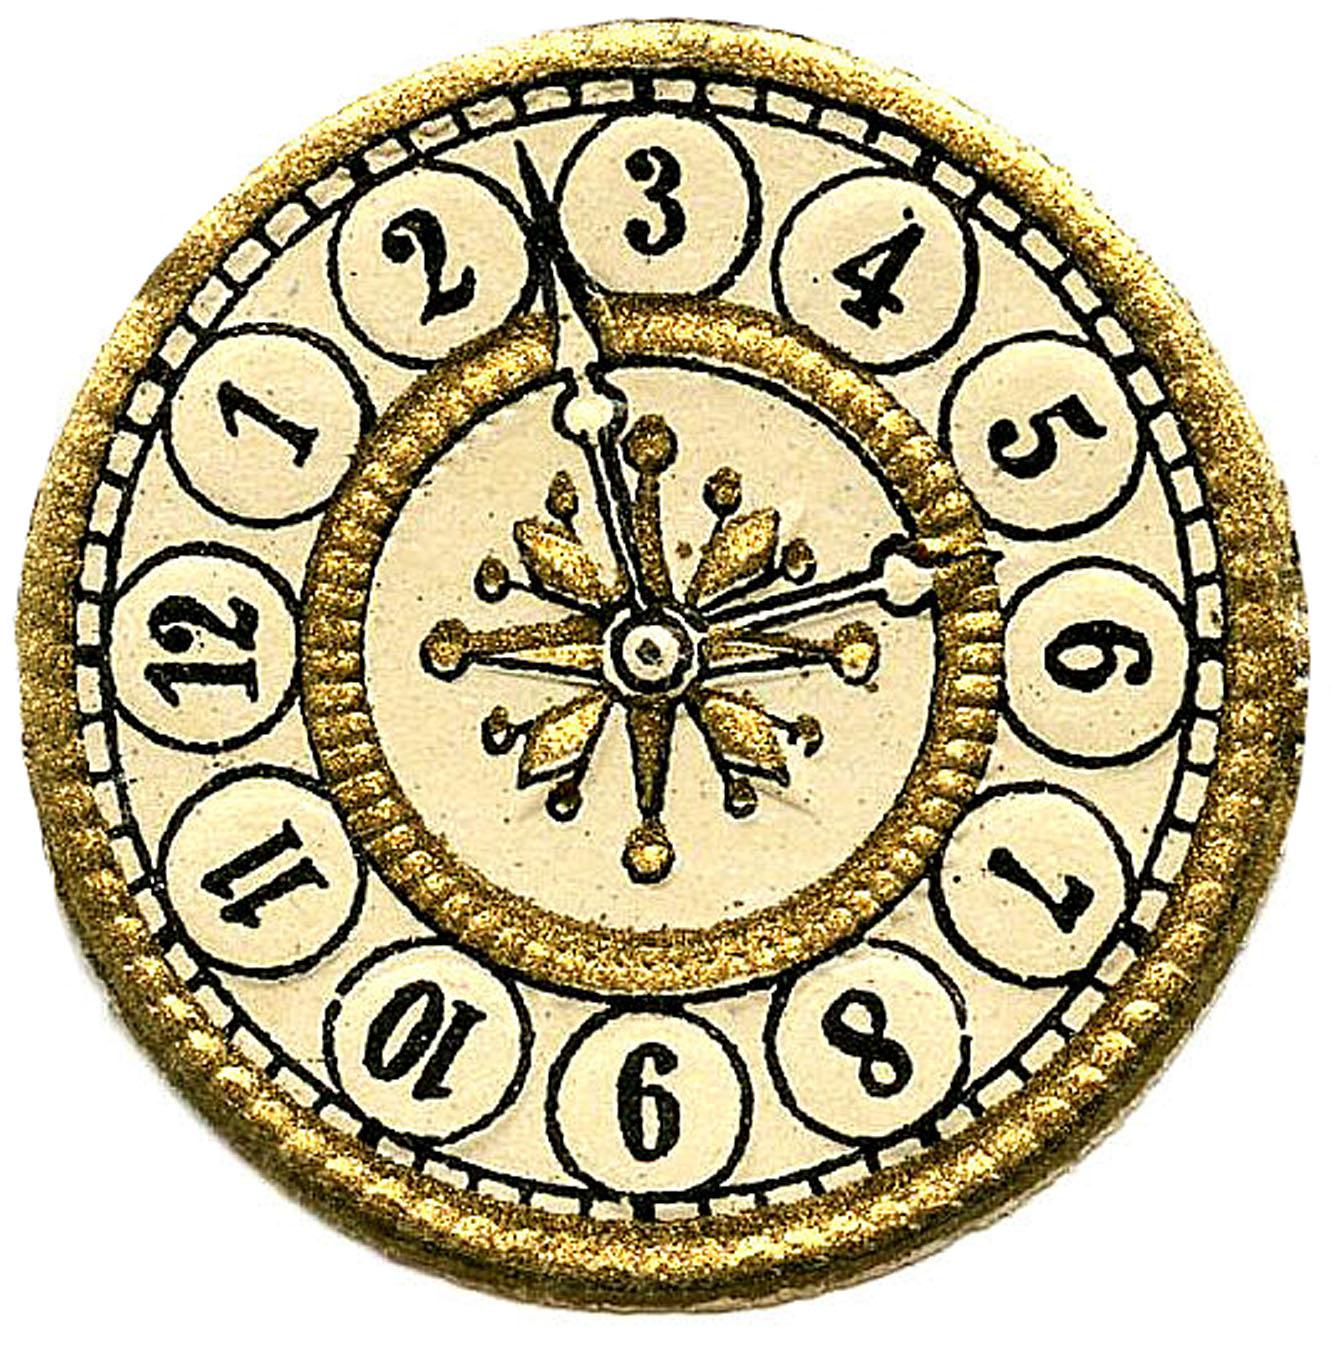 Vintage Clip Art - Scrap Clock Faces - S-Vintage Clip Art - Scrap Clock Faces - Steampunk - The Graphics Fairy-17